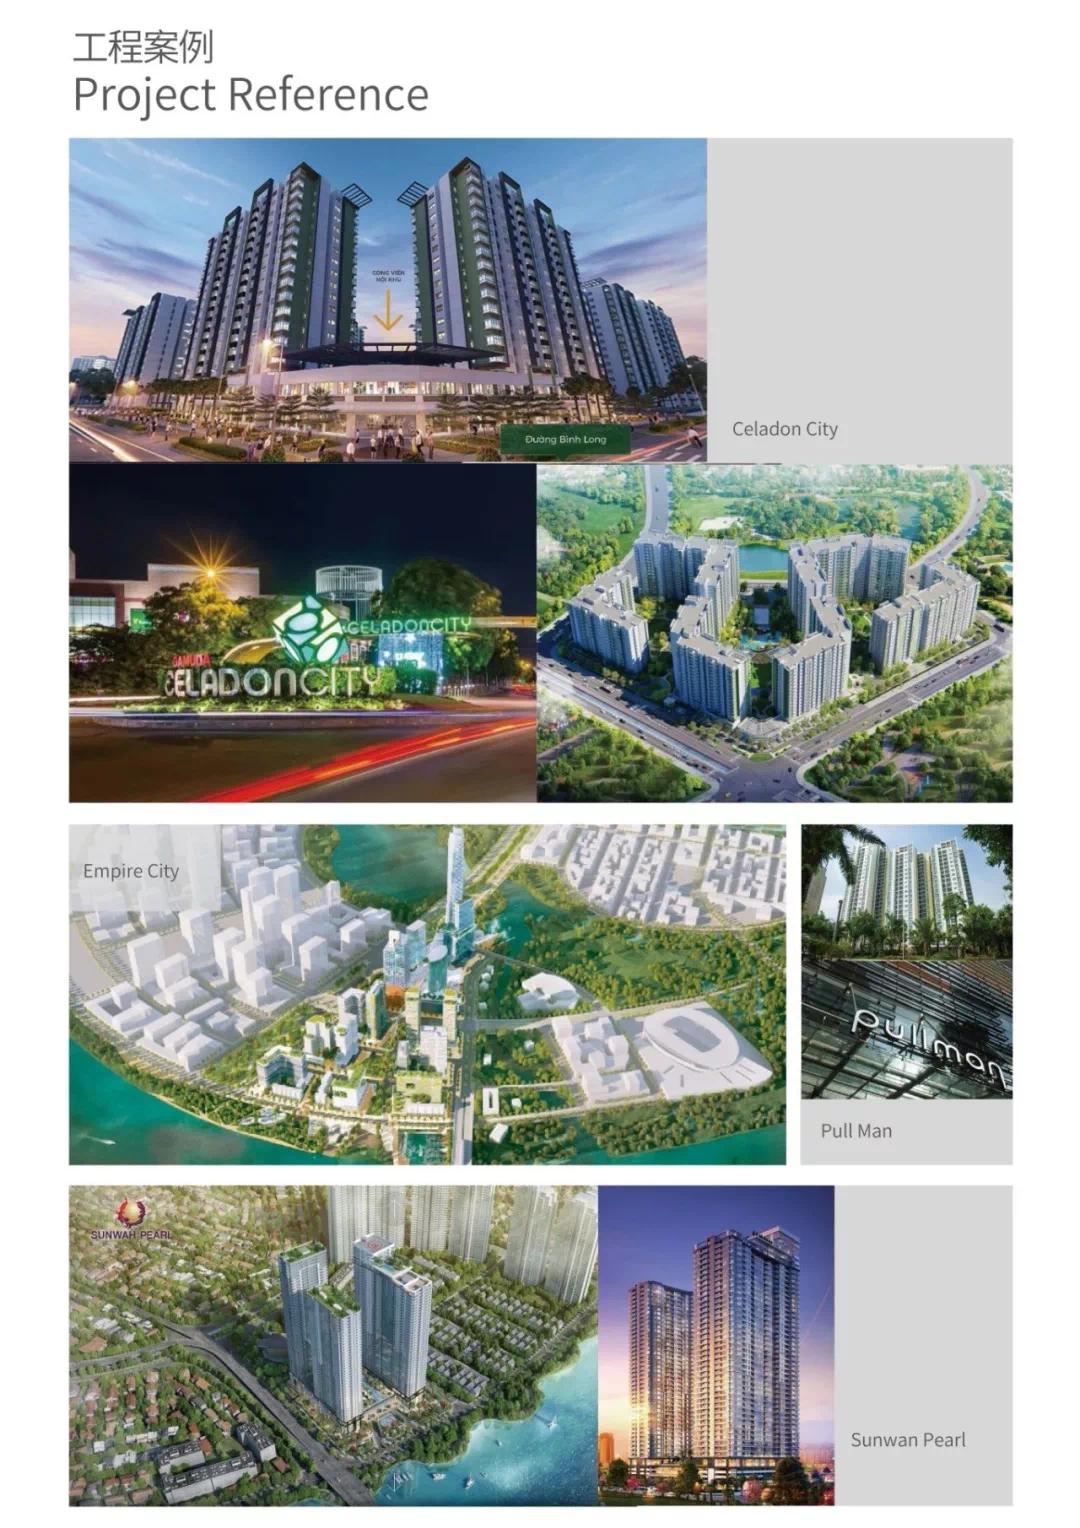 【INNOCI艺耐】非凡创意再出发 2018越南河内国际建材